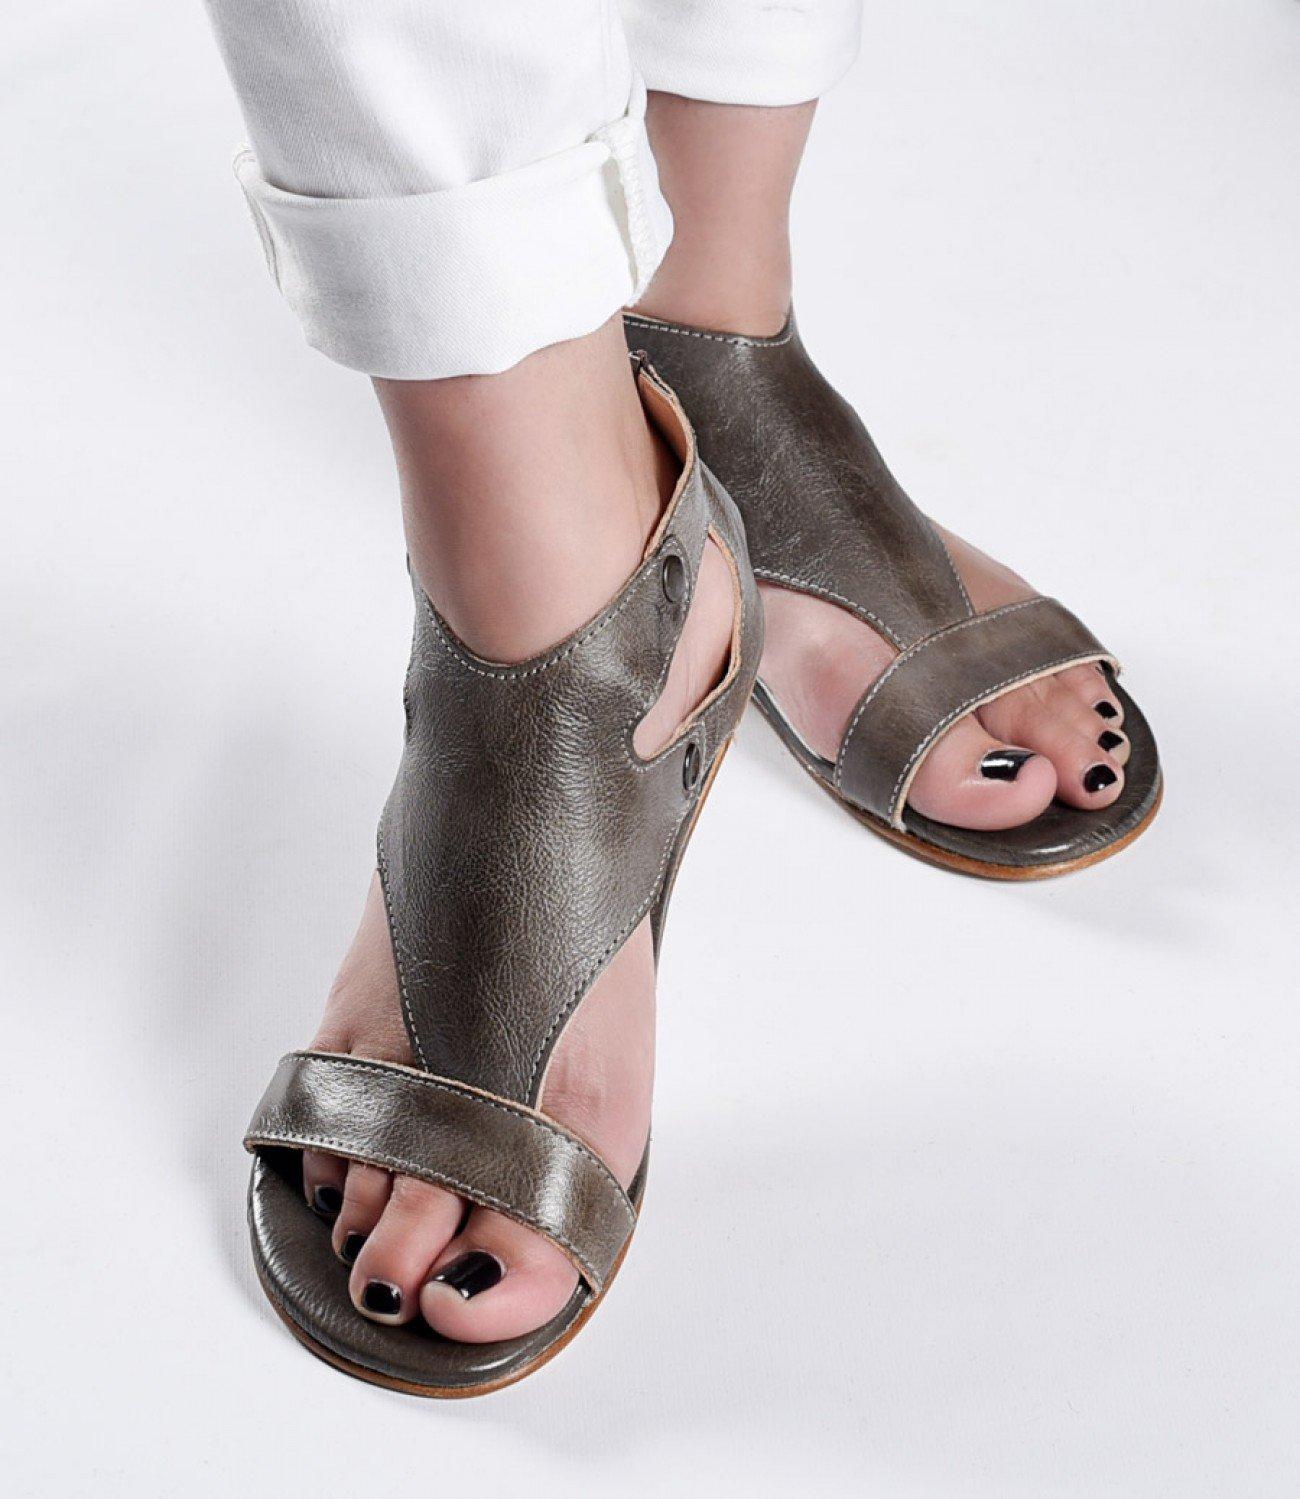 Bed Stu Women's Soto Leather Sandal B07CNWF78H 10 B(M) US Taupe Rustic